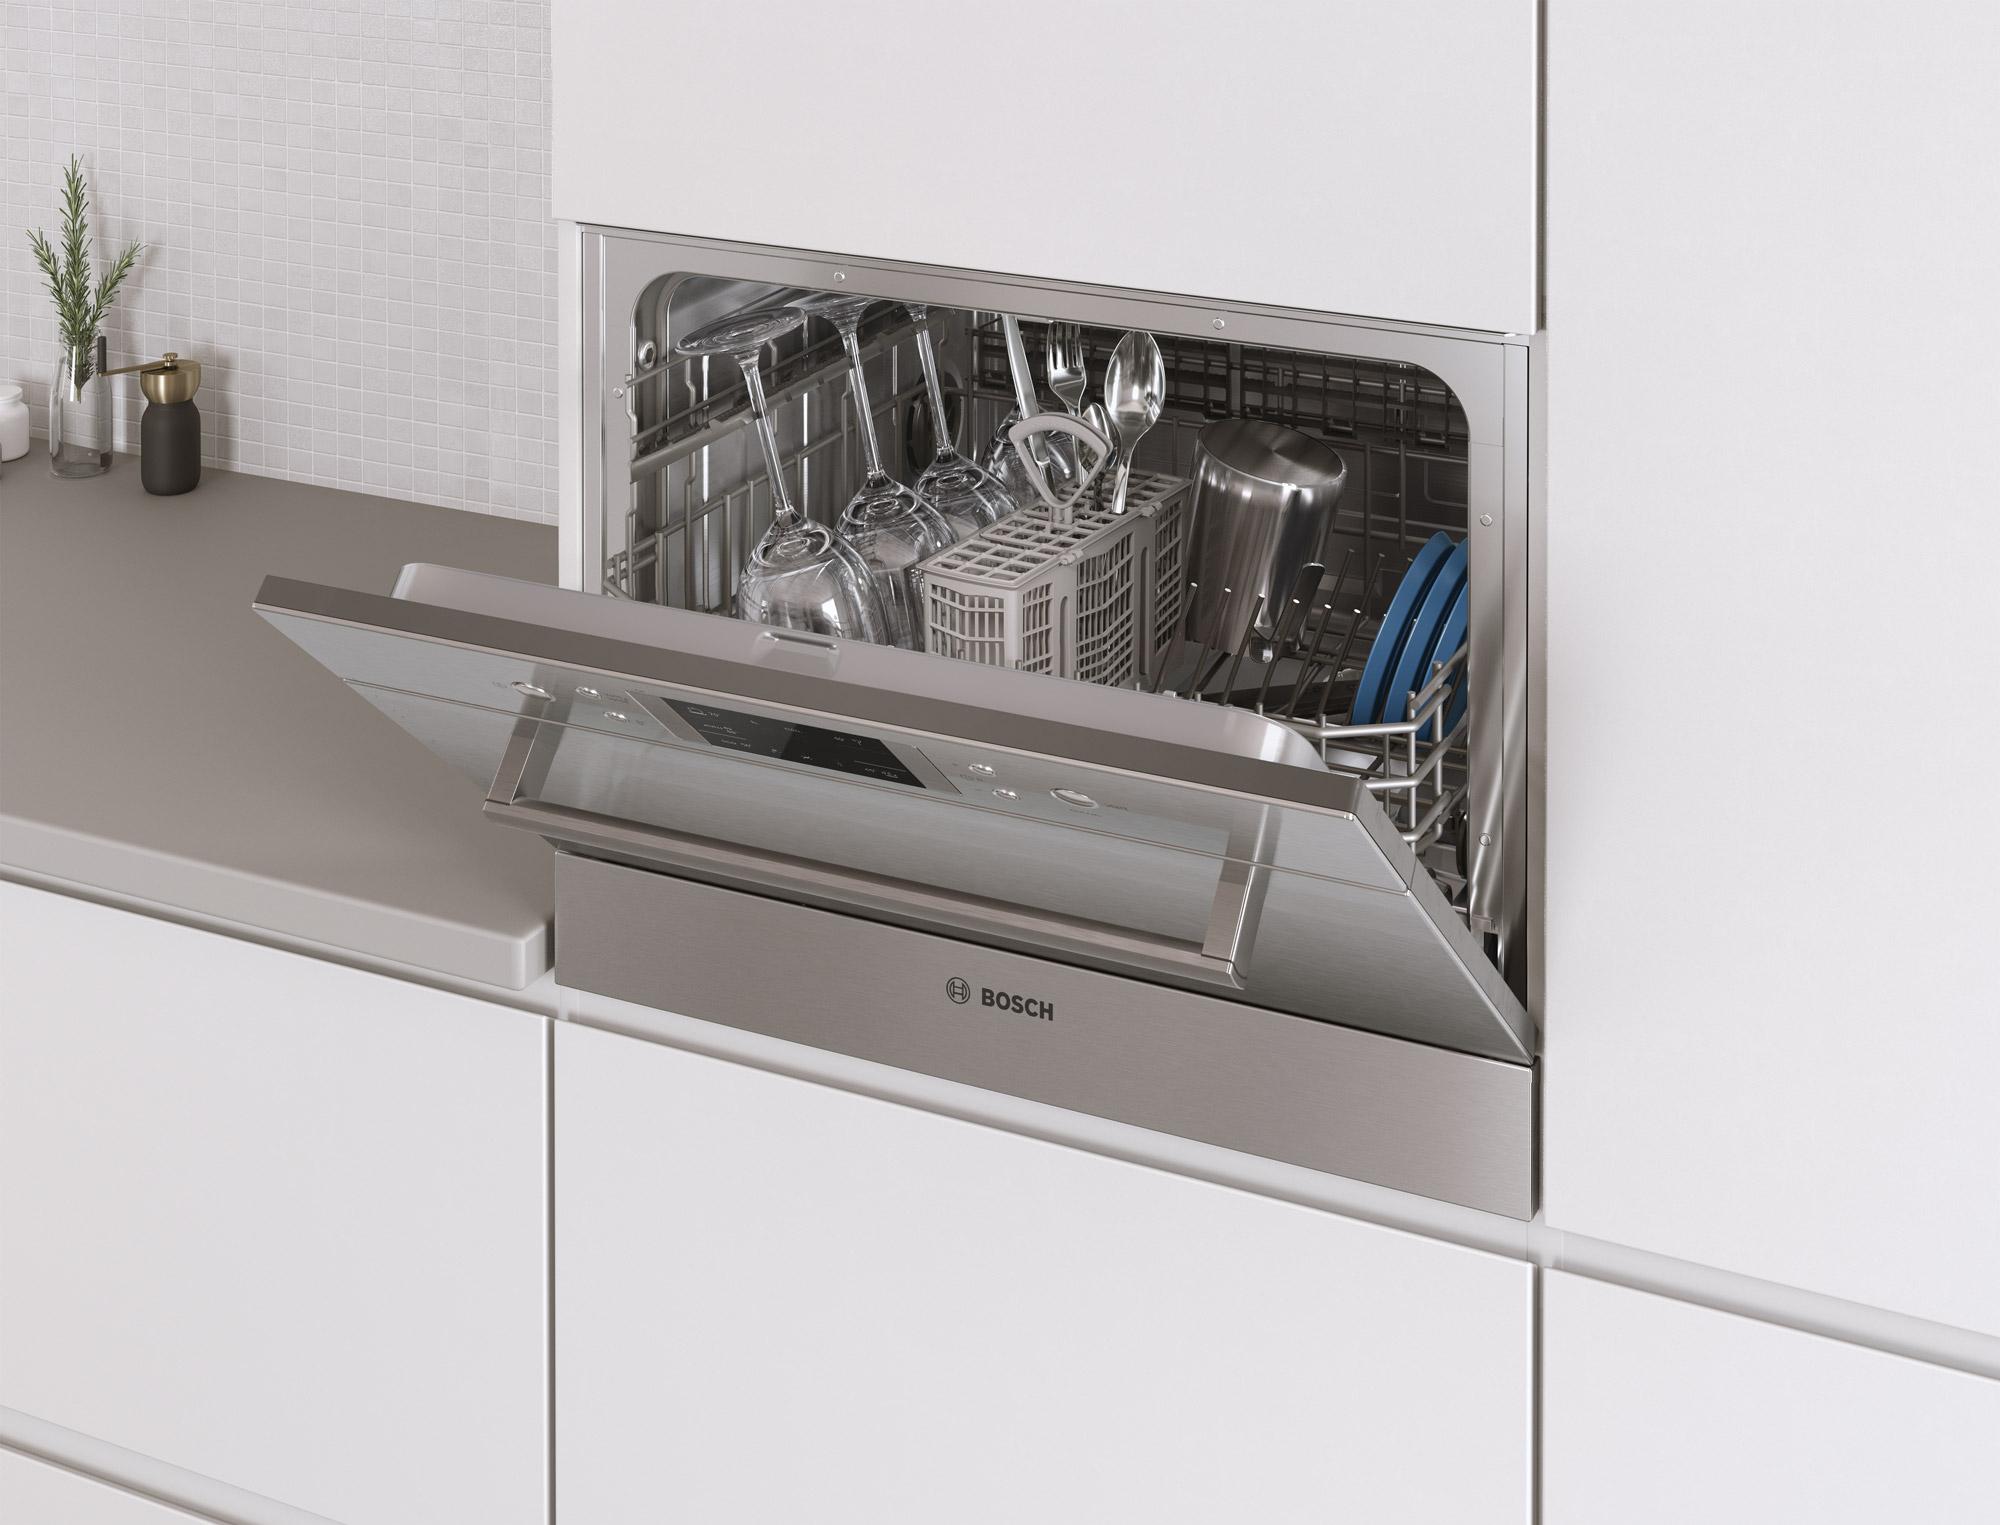 CGI - Bosch - Home Appliances - Built-in Dishwasher